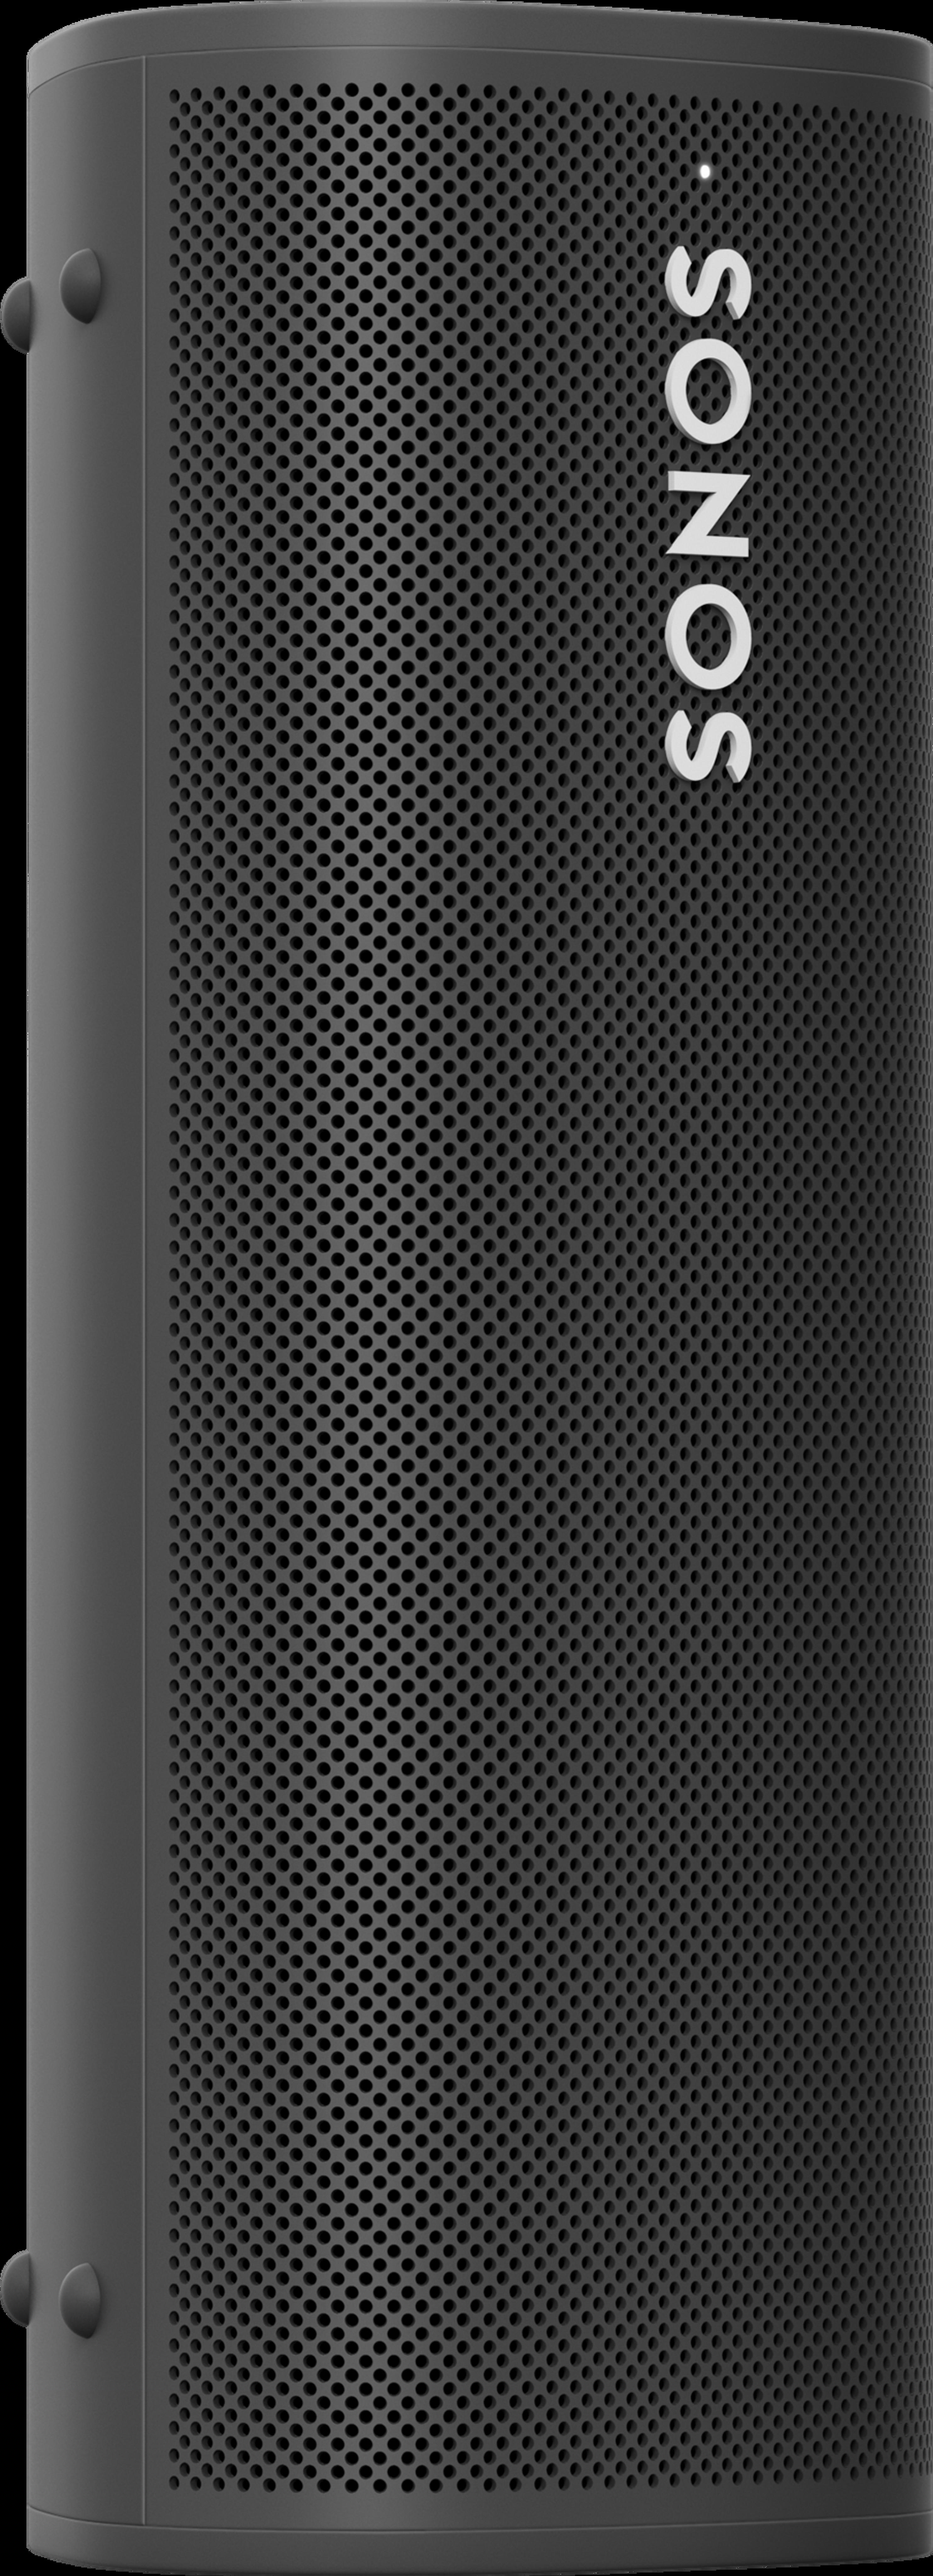 Roam front angle black